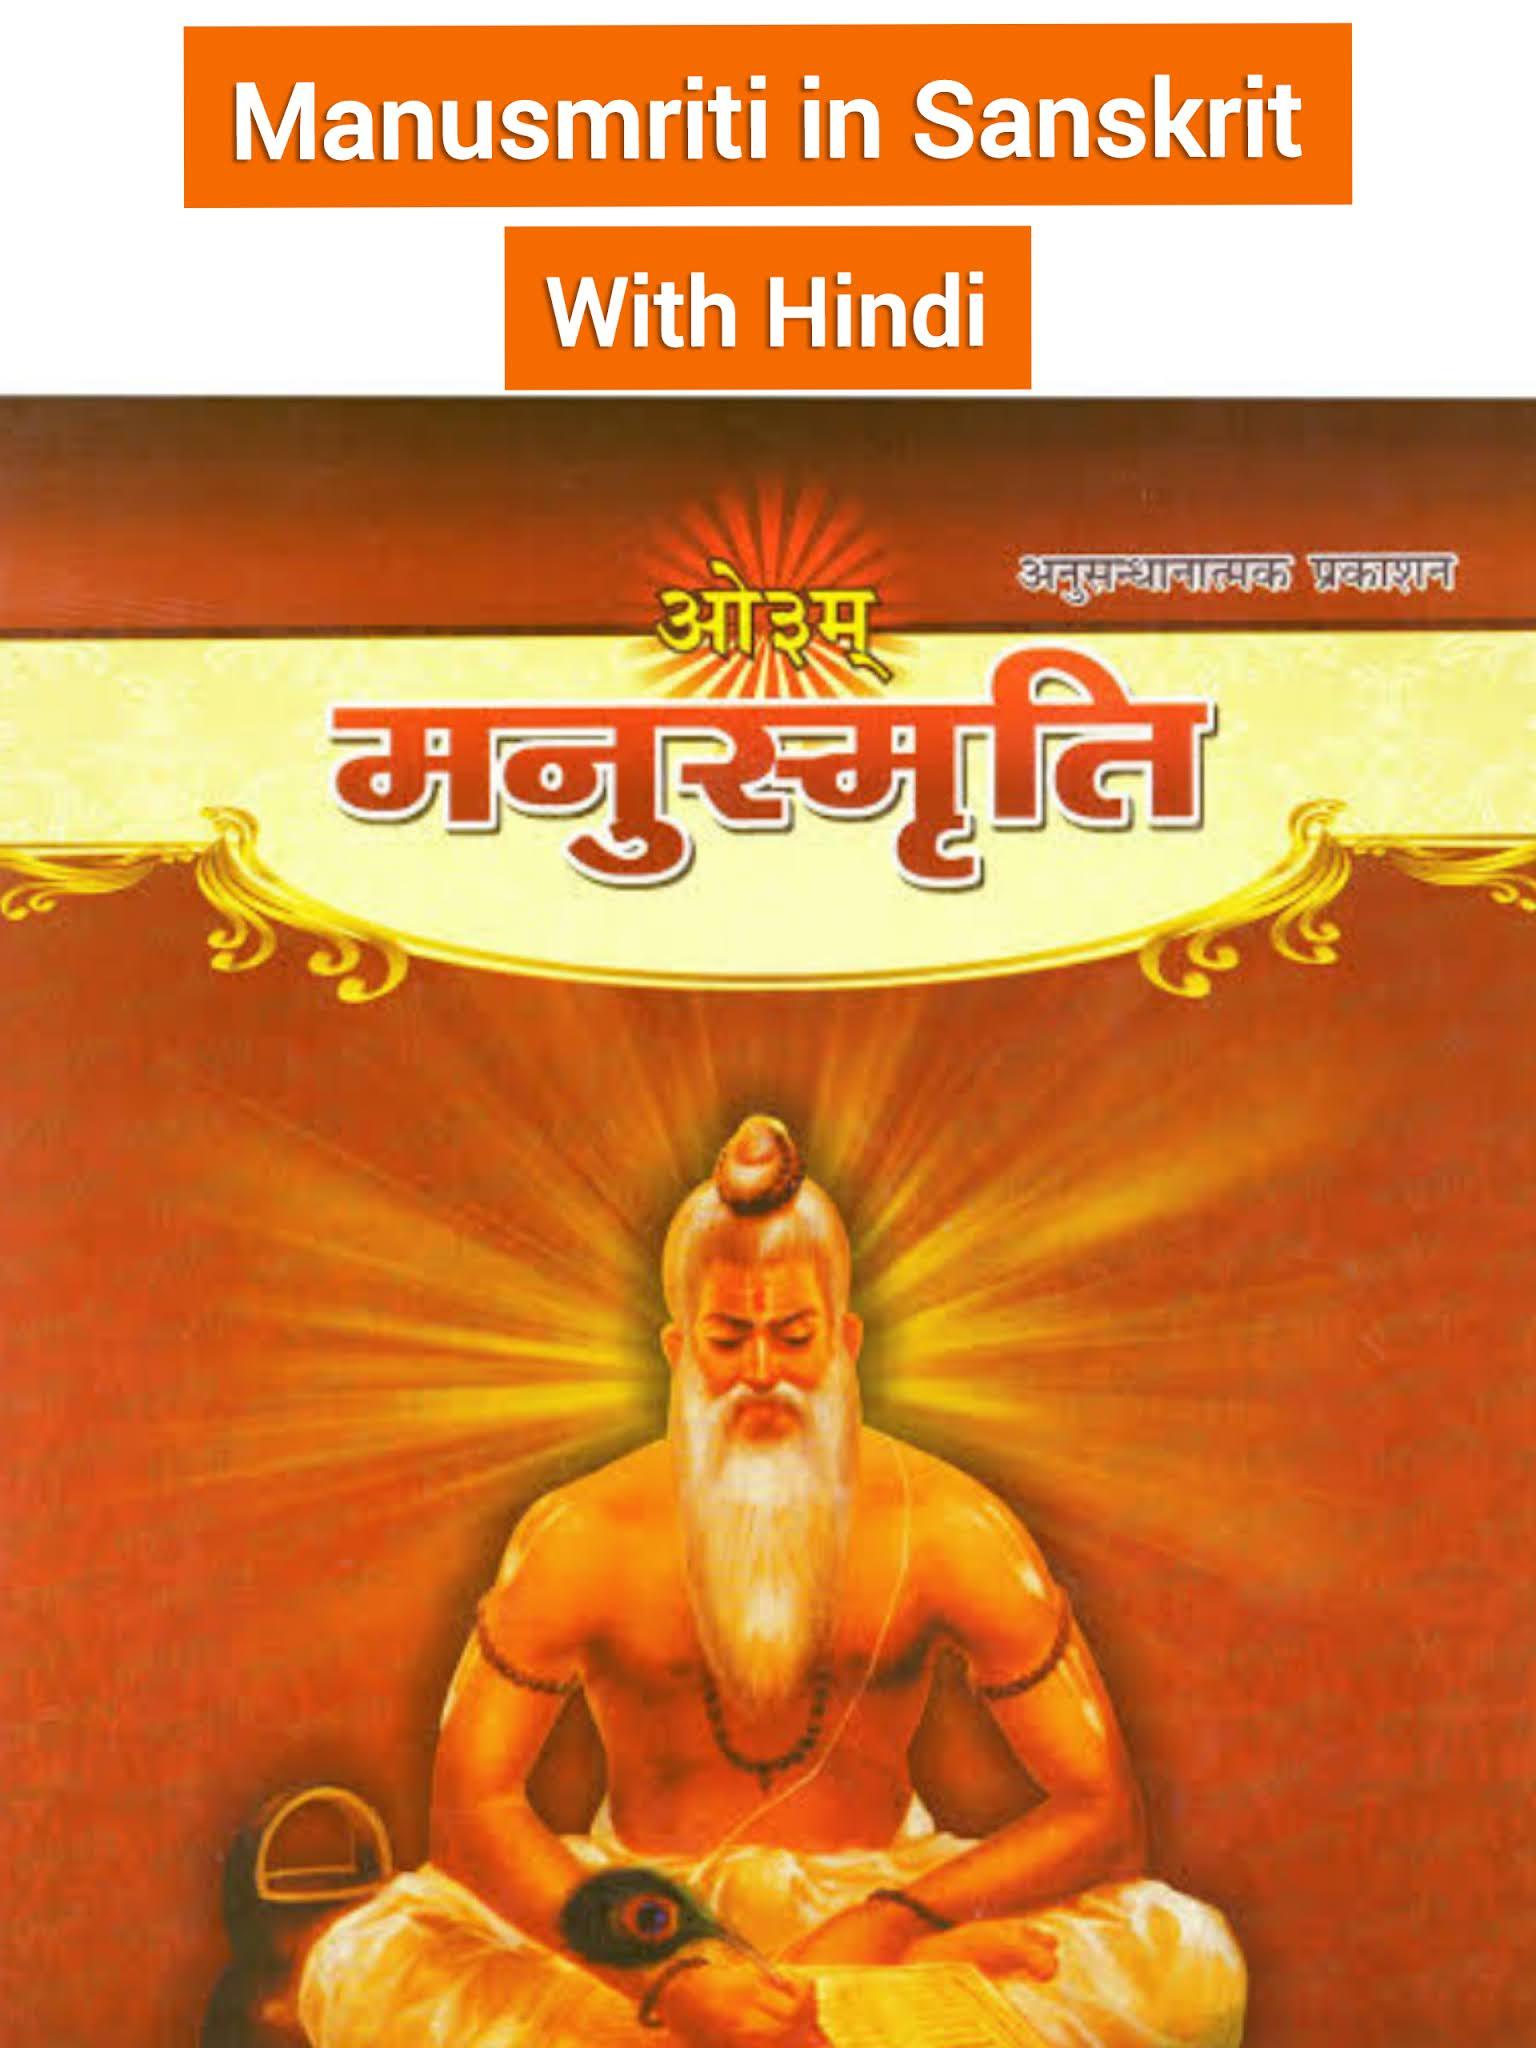 Manusmriti in Sanskrit with hindi translation